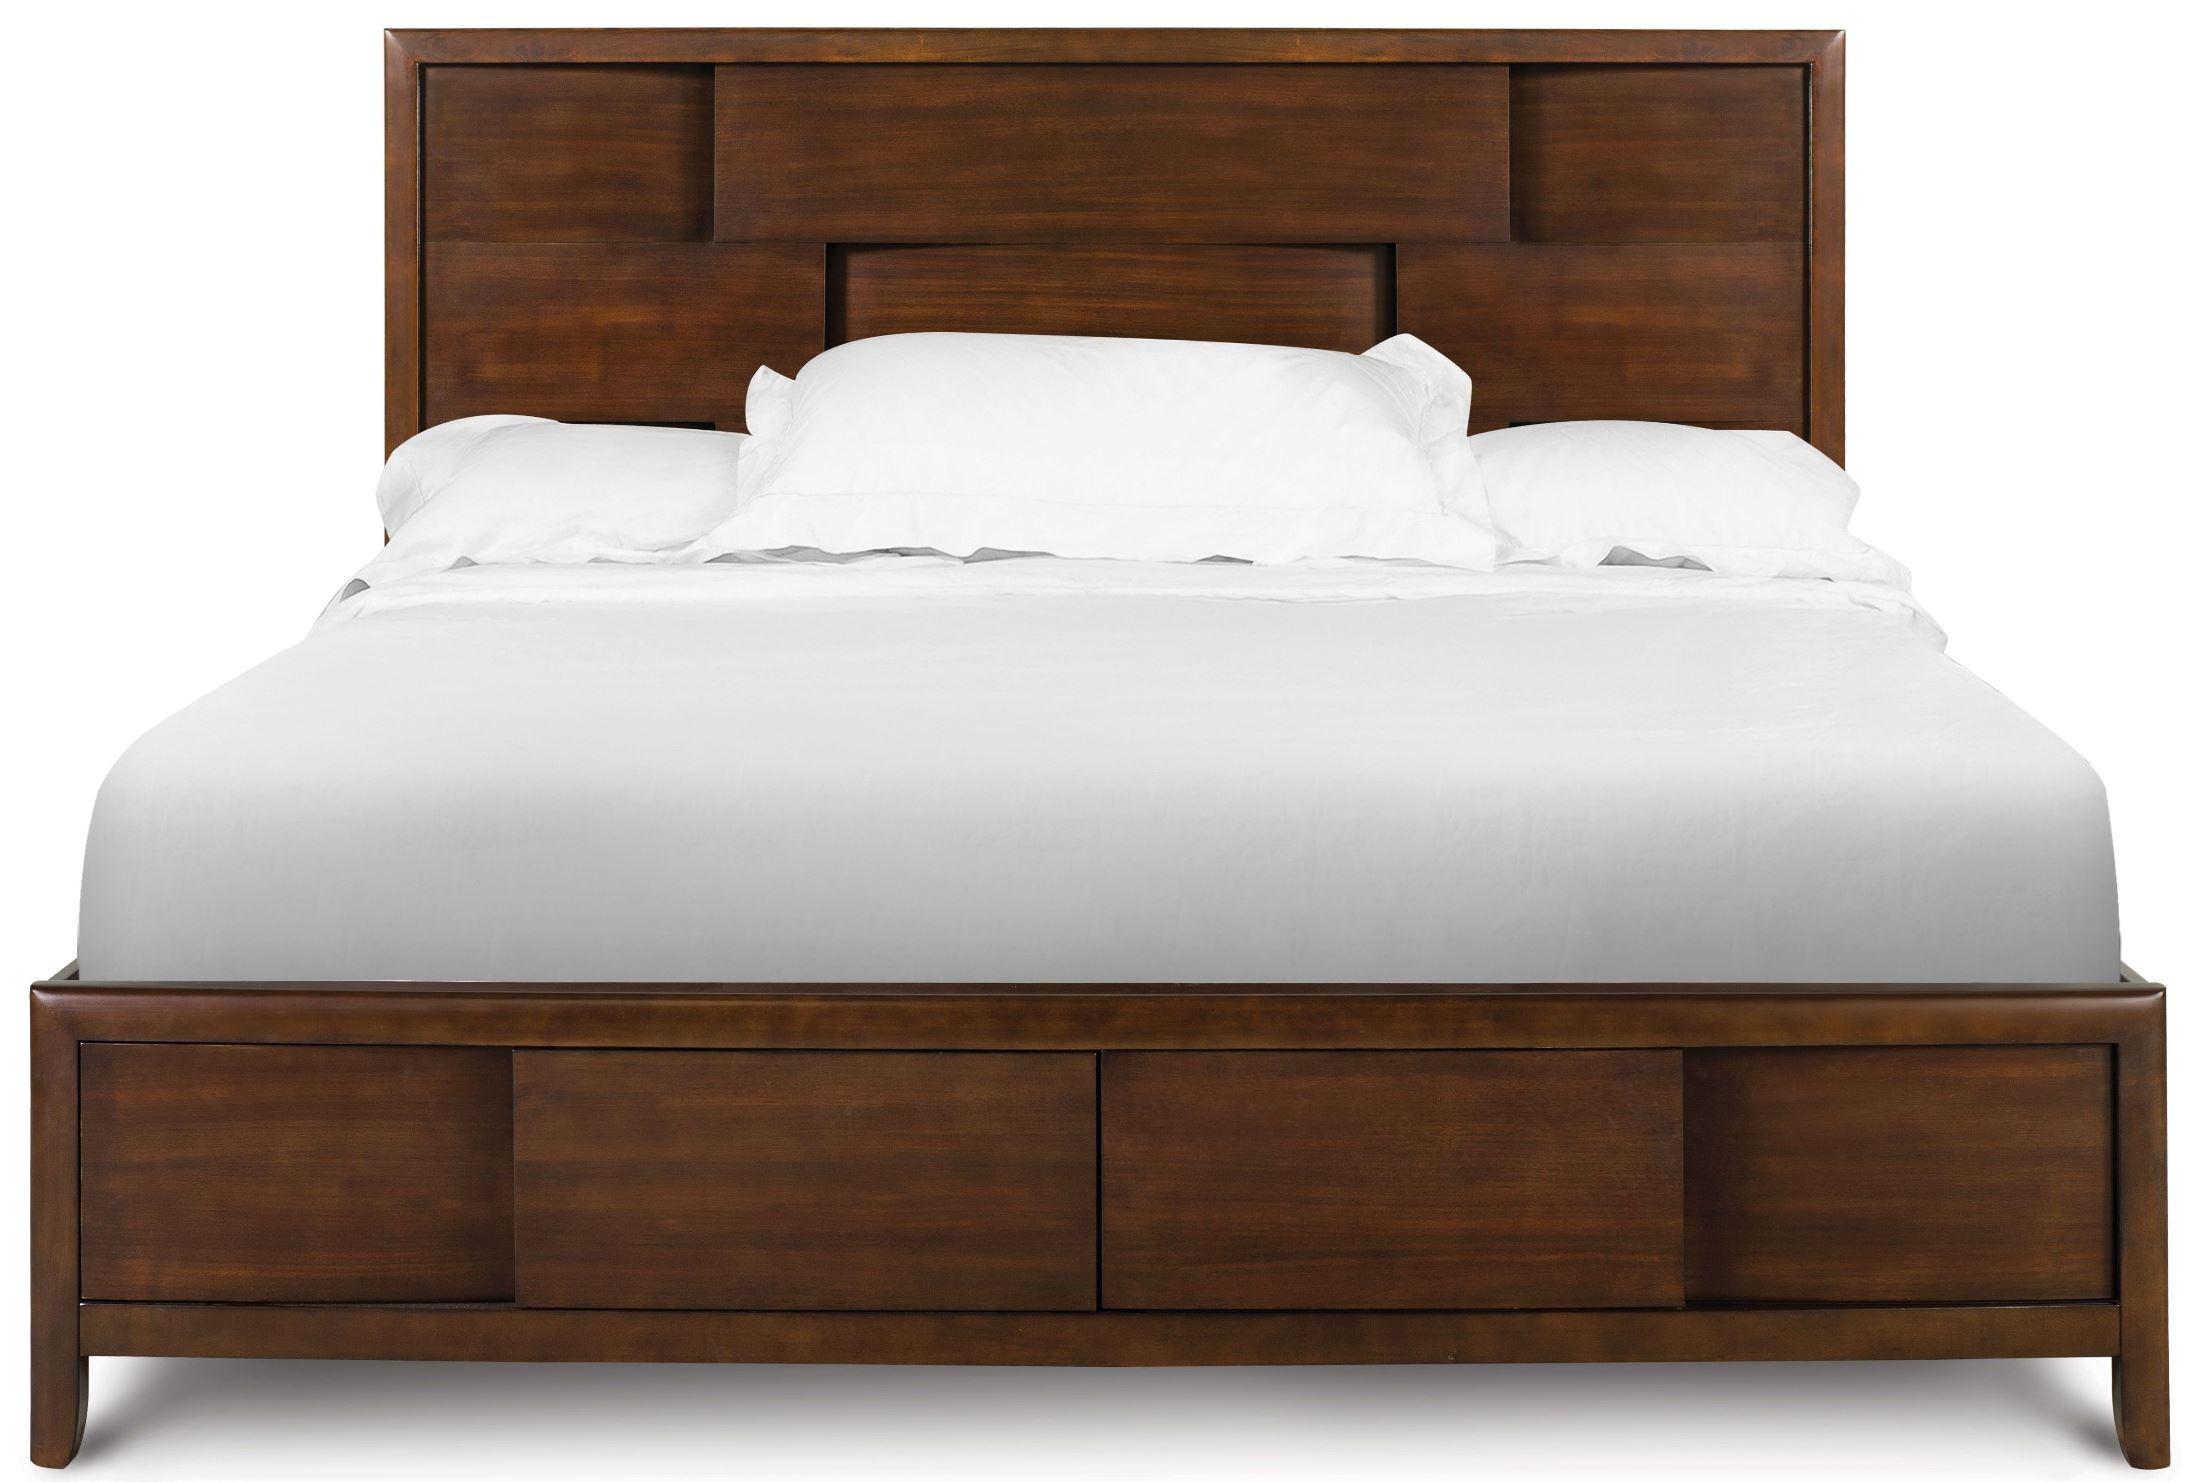 Nova Cal King Island Bed With Regular Footboard From